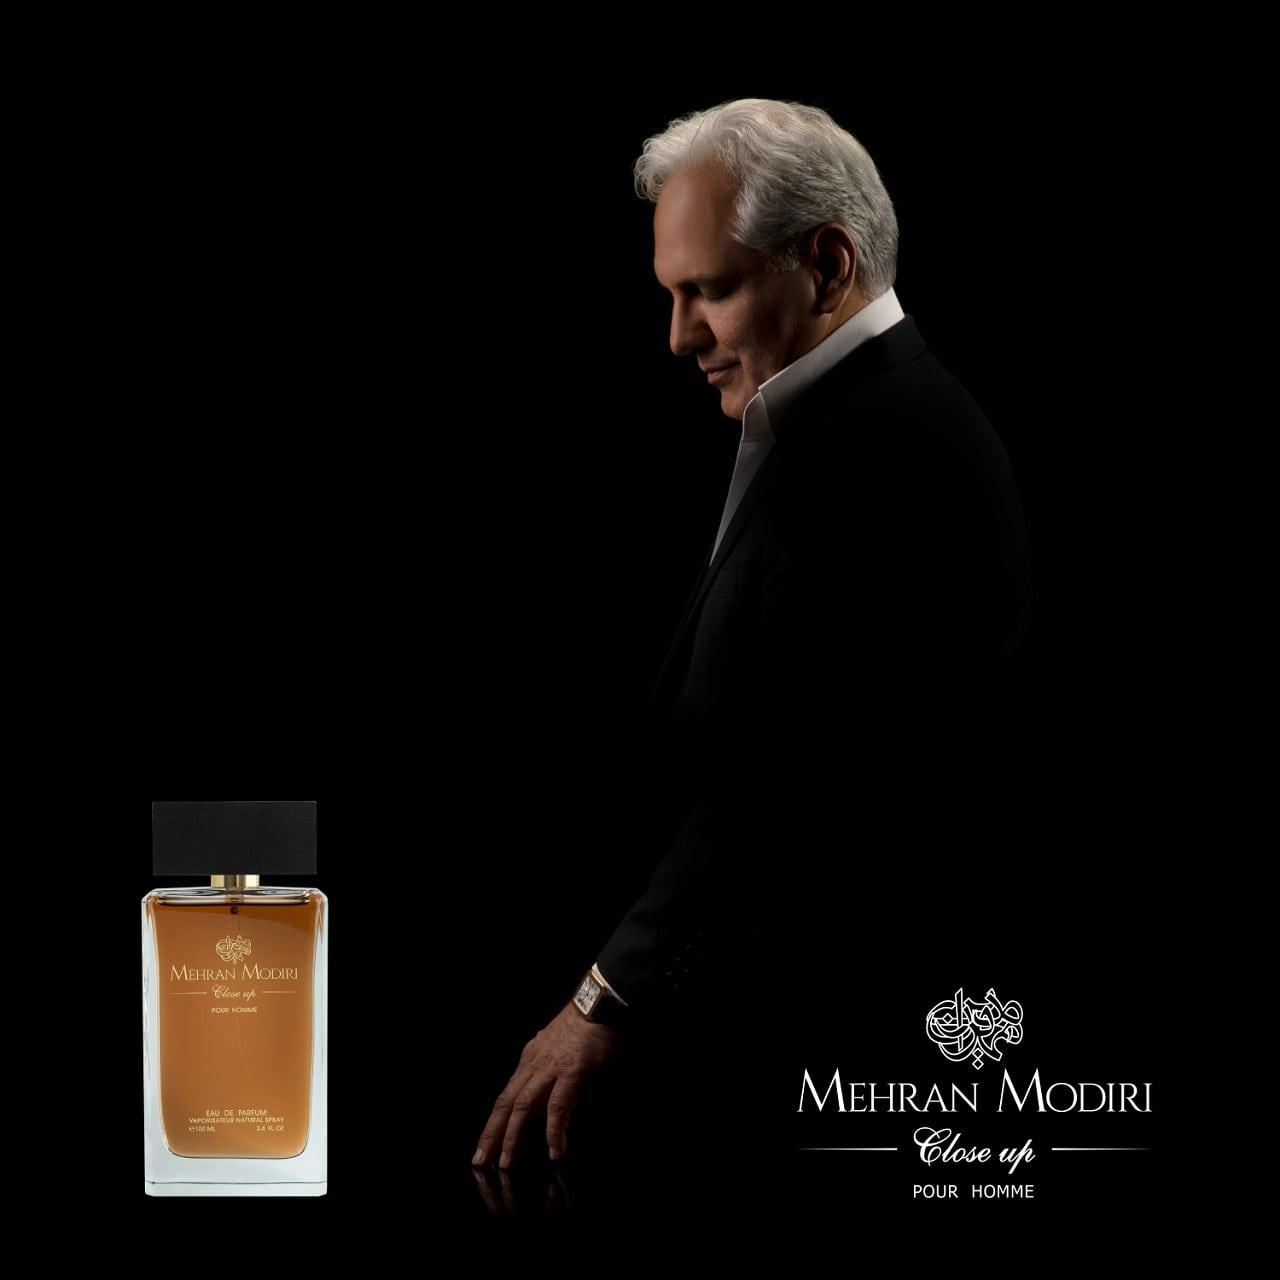 بررسی، مشاهده قیمت و خرید عطر (ادکلن) مهران مدیری کلوز آپ پور هوم Mehran Modiri Close Up Pour HommeGuerlain L'Homme Ideal Cologne اصل